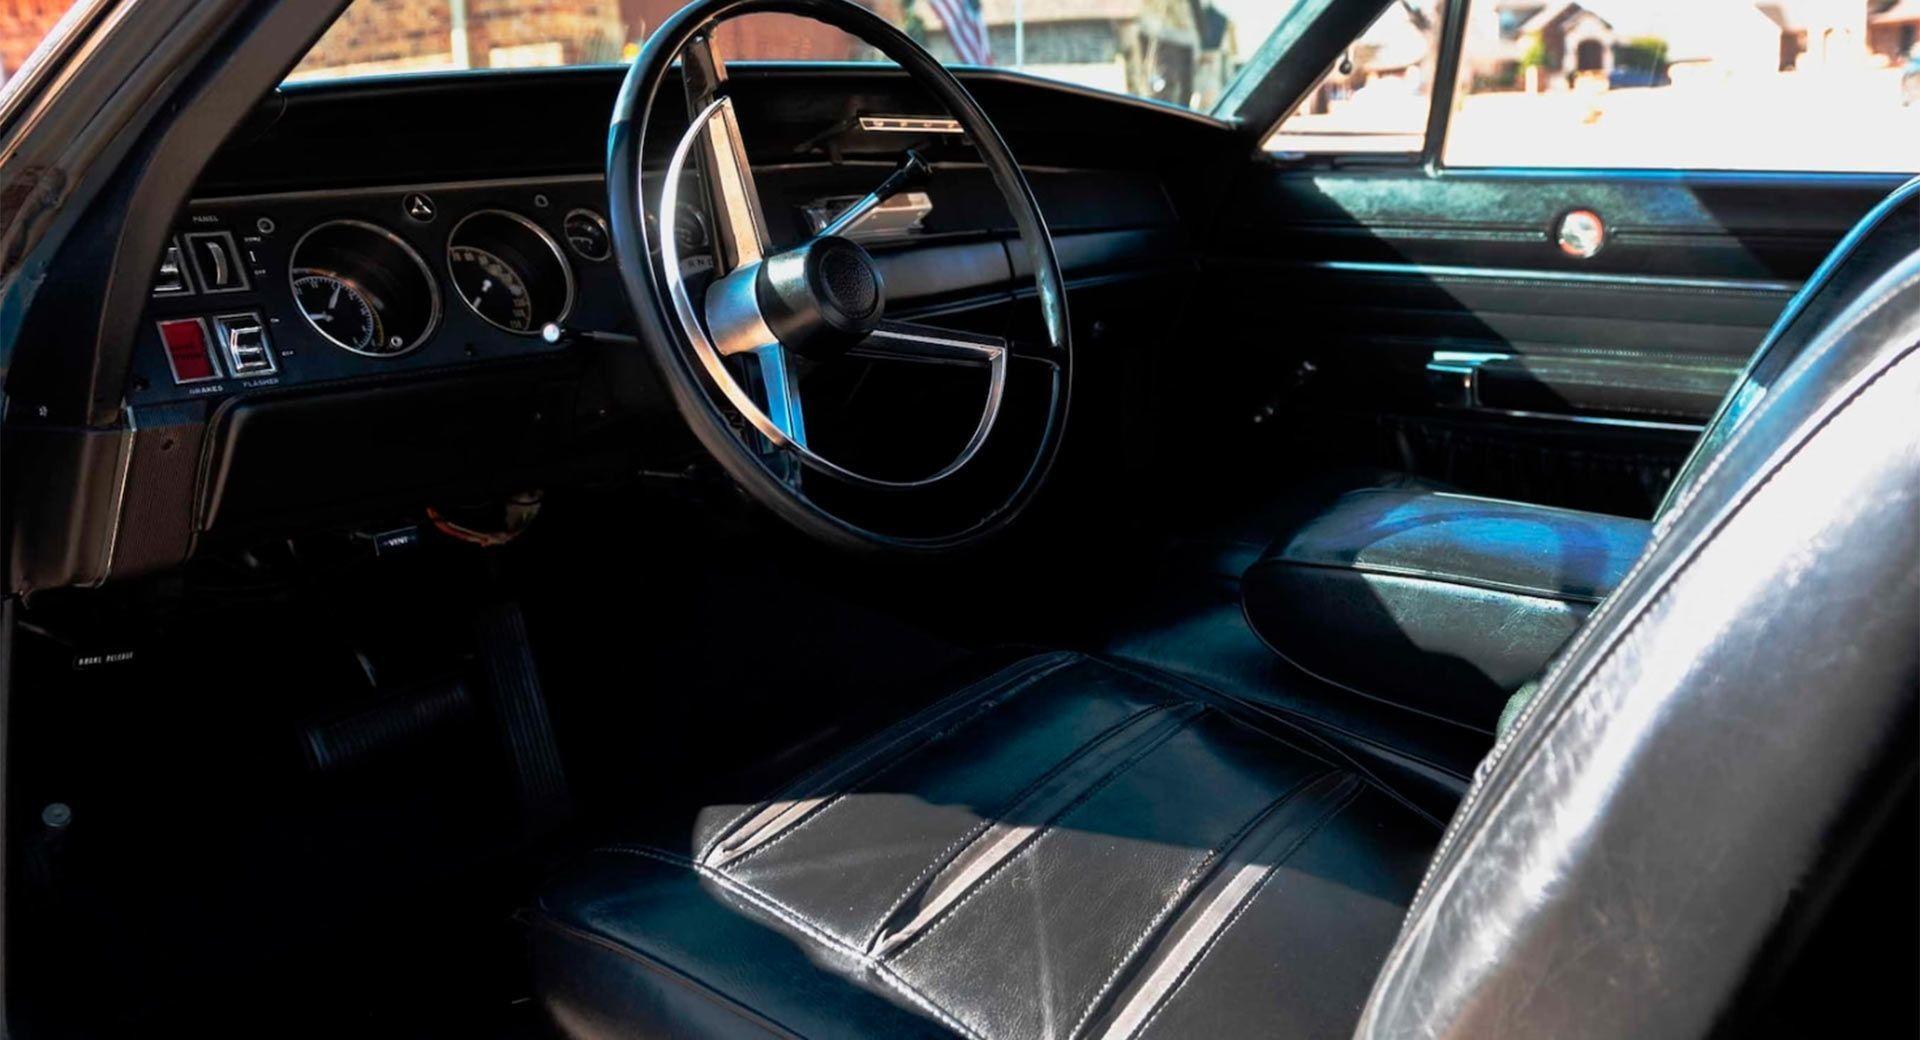 Классический американский масл-кар Dodge Charger Hemi R/T 1968 года